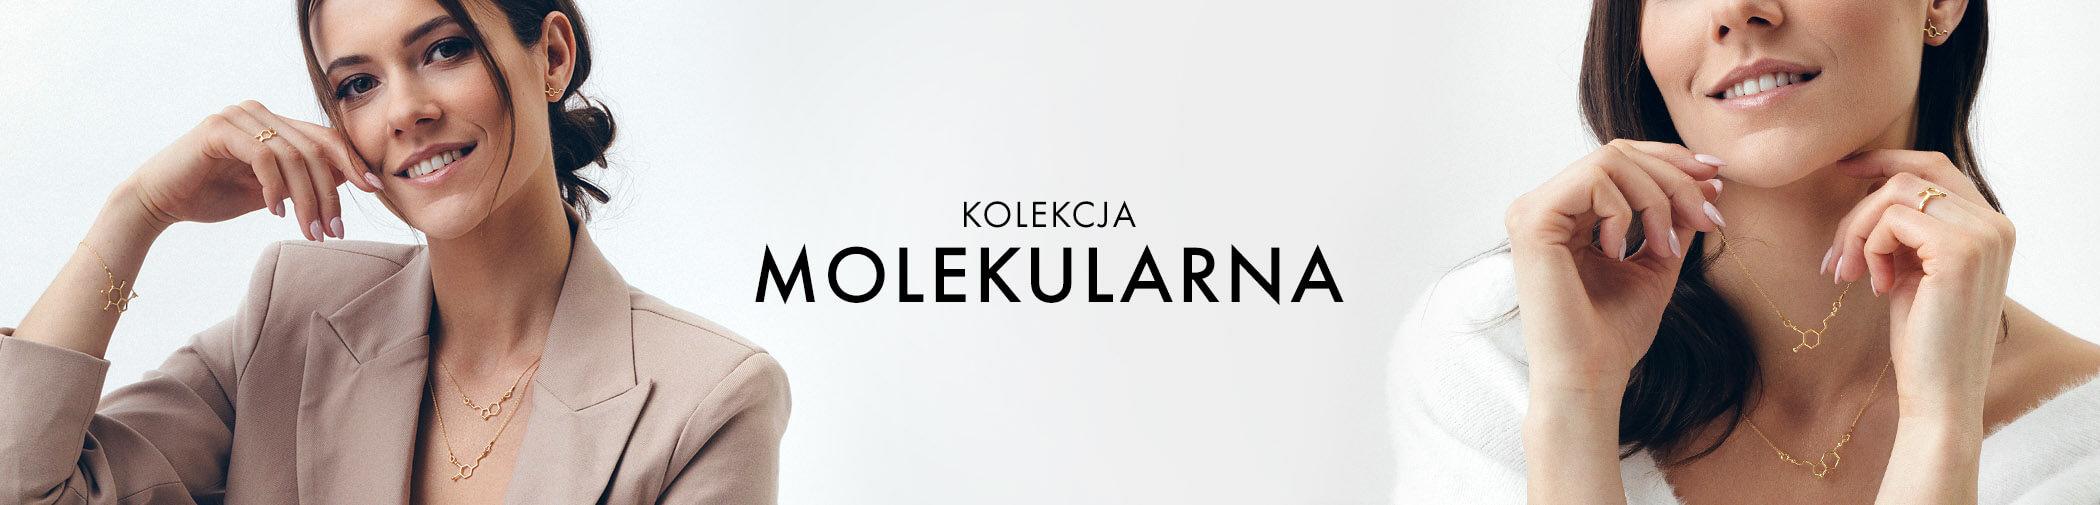 Kolekcja Molekularna